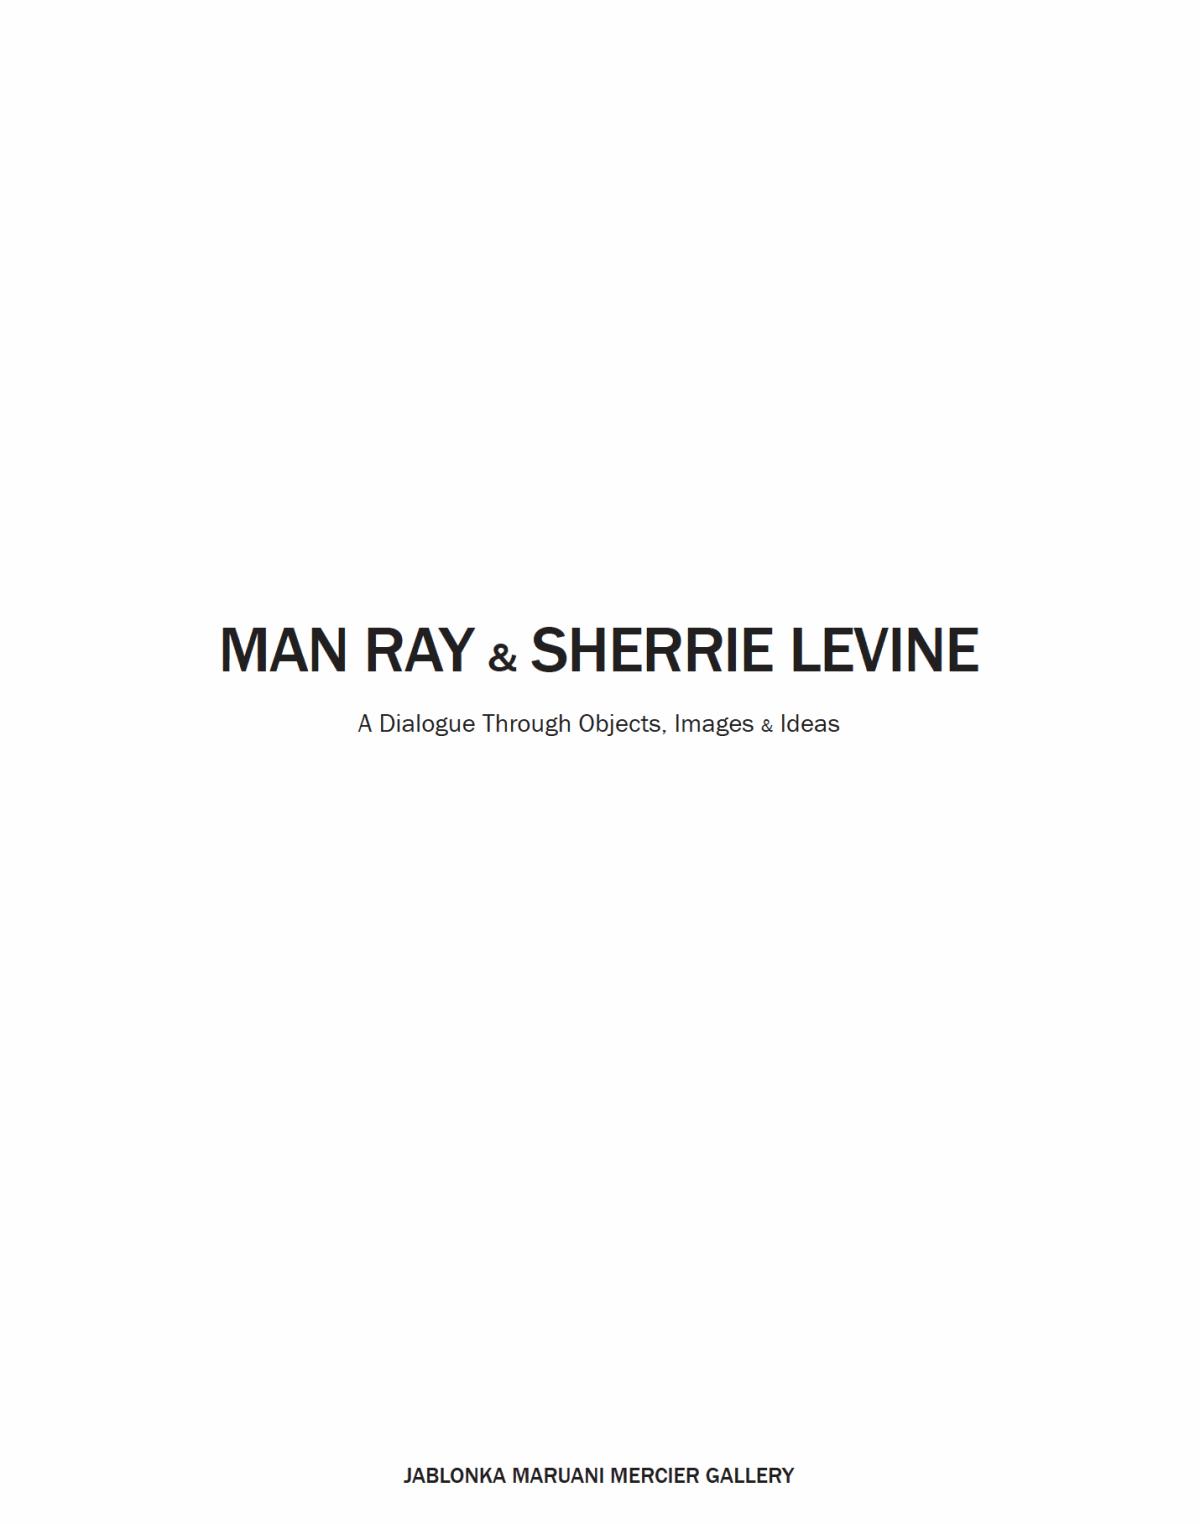 Man Ray & Sherrie Levine